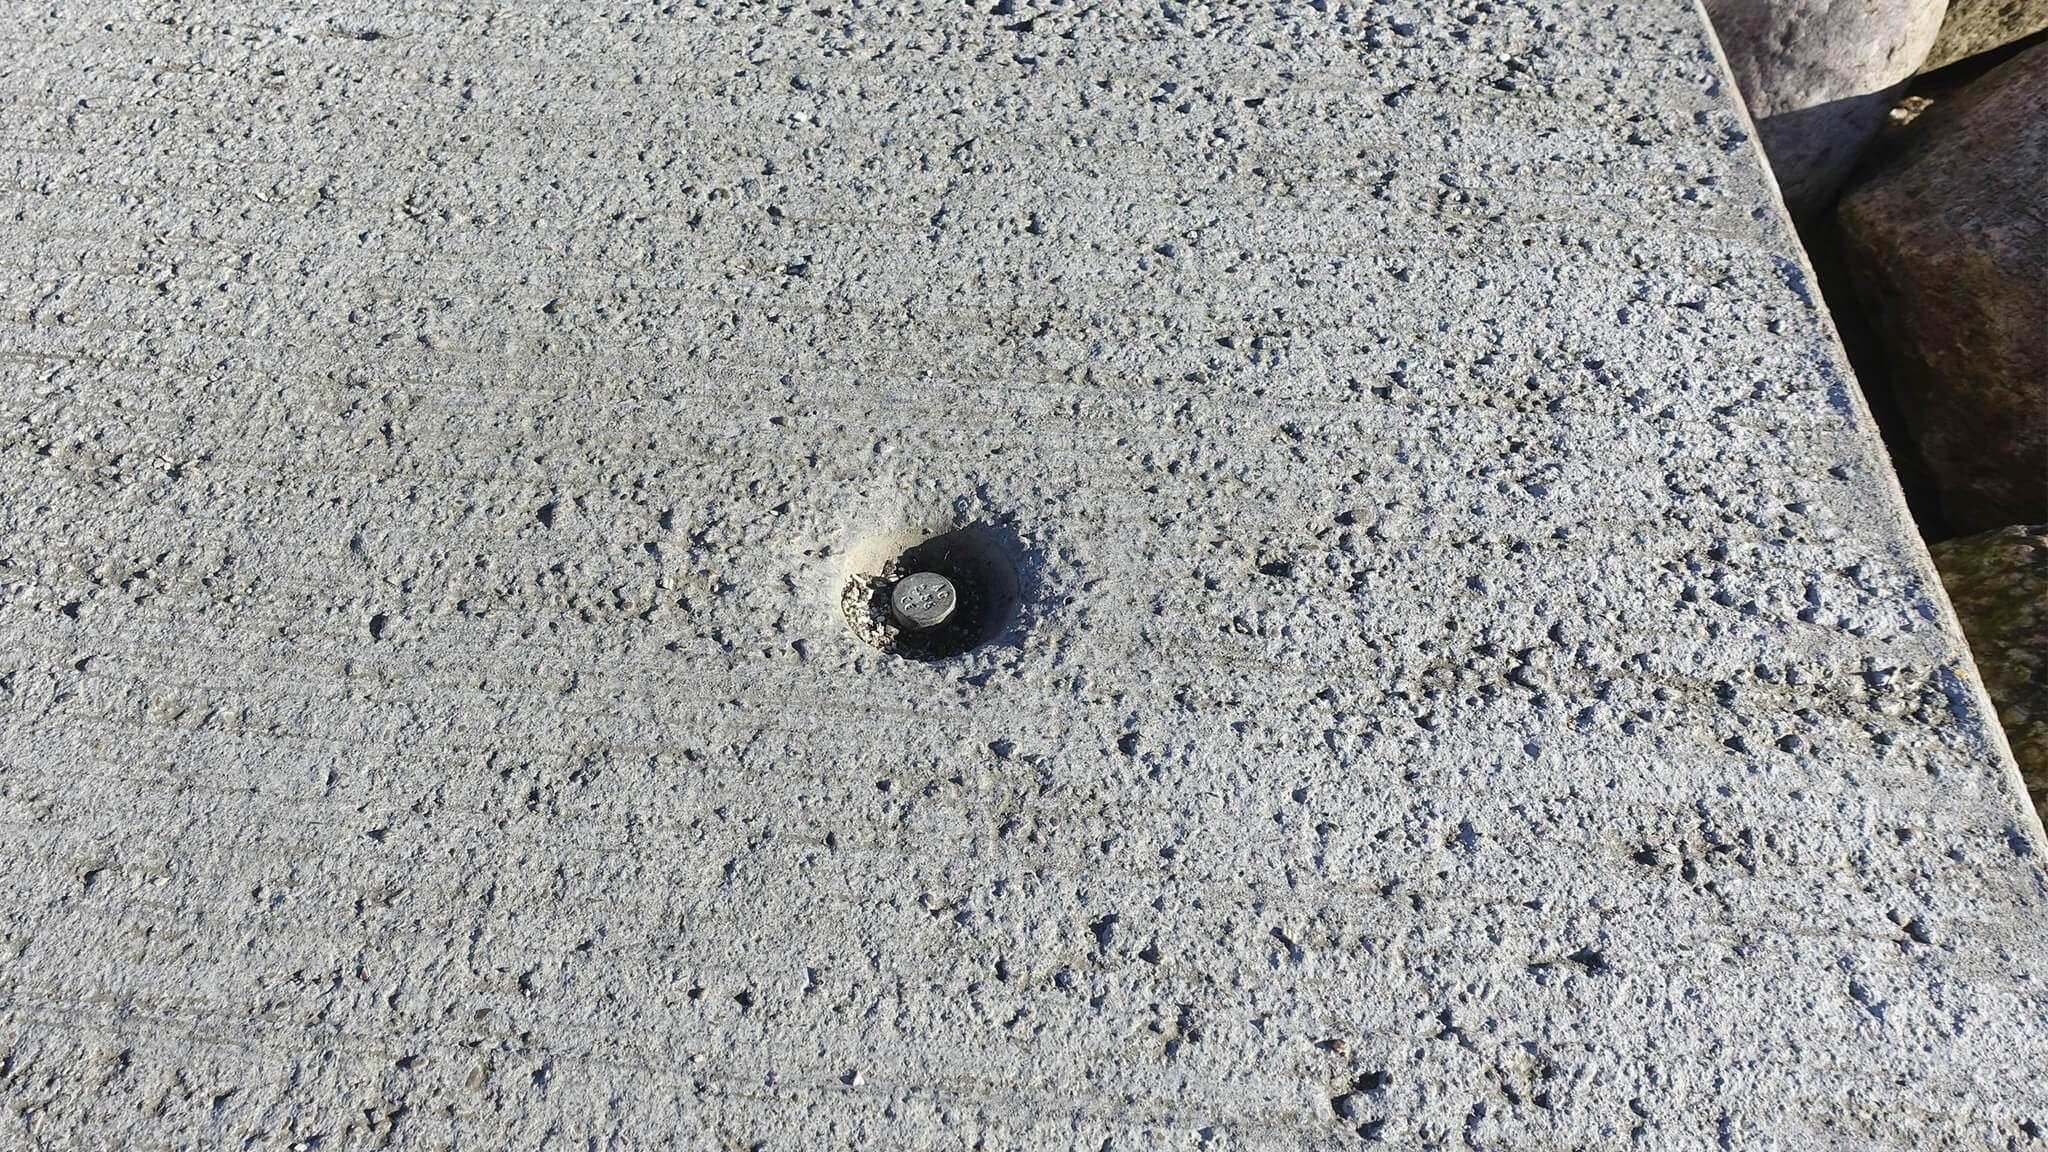 mole_overflade_i_beton